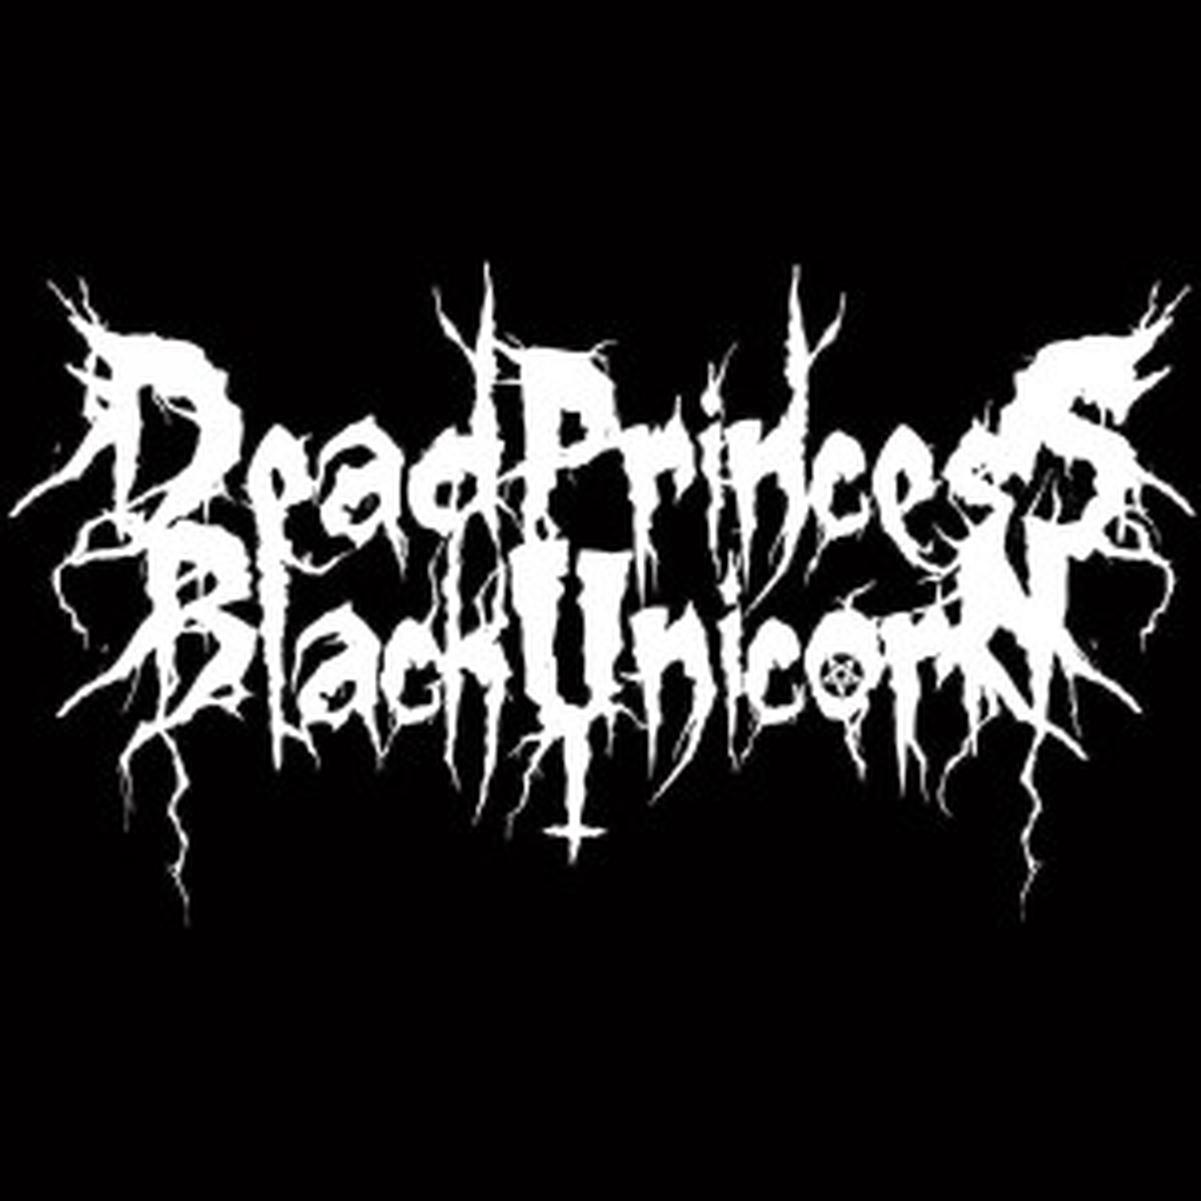 Dead Princess Black Unicorn